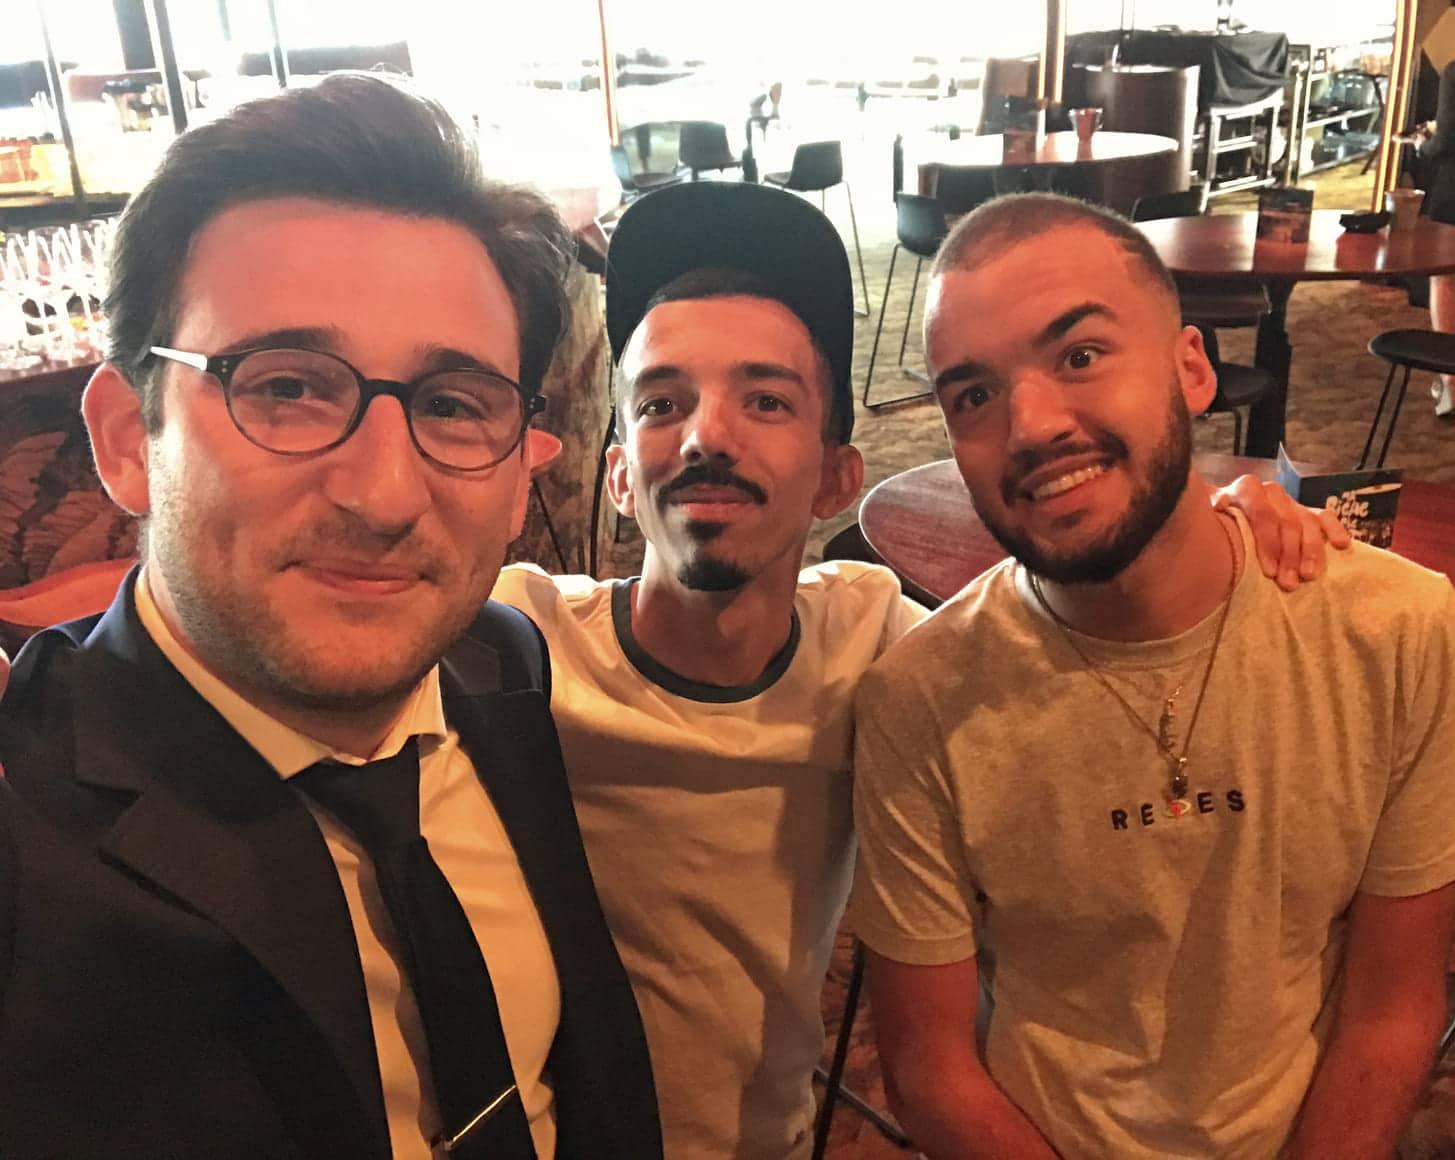 Magicien Toulouse - Bigflo et Oli - Mentalisme